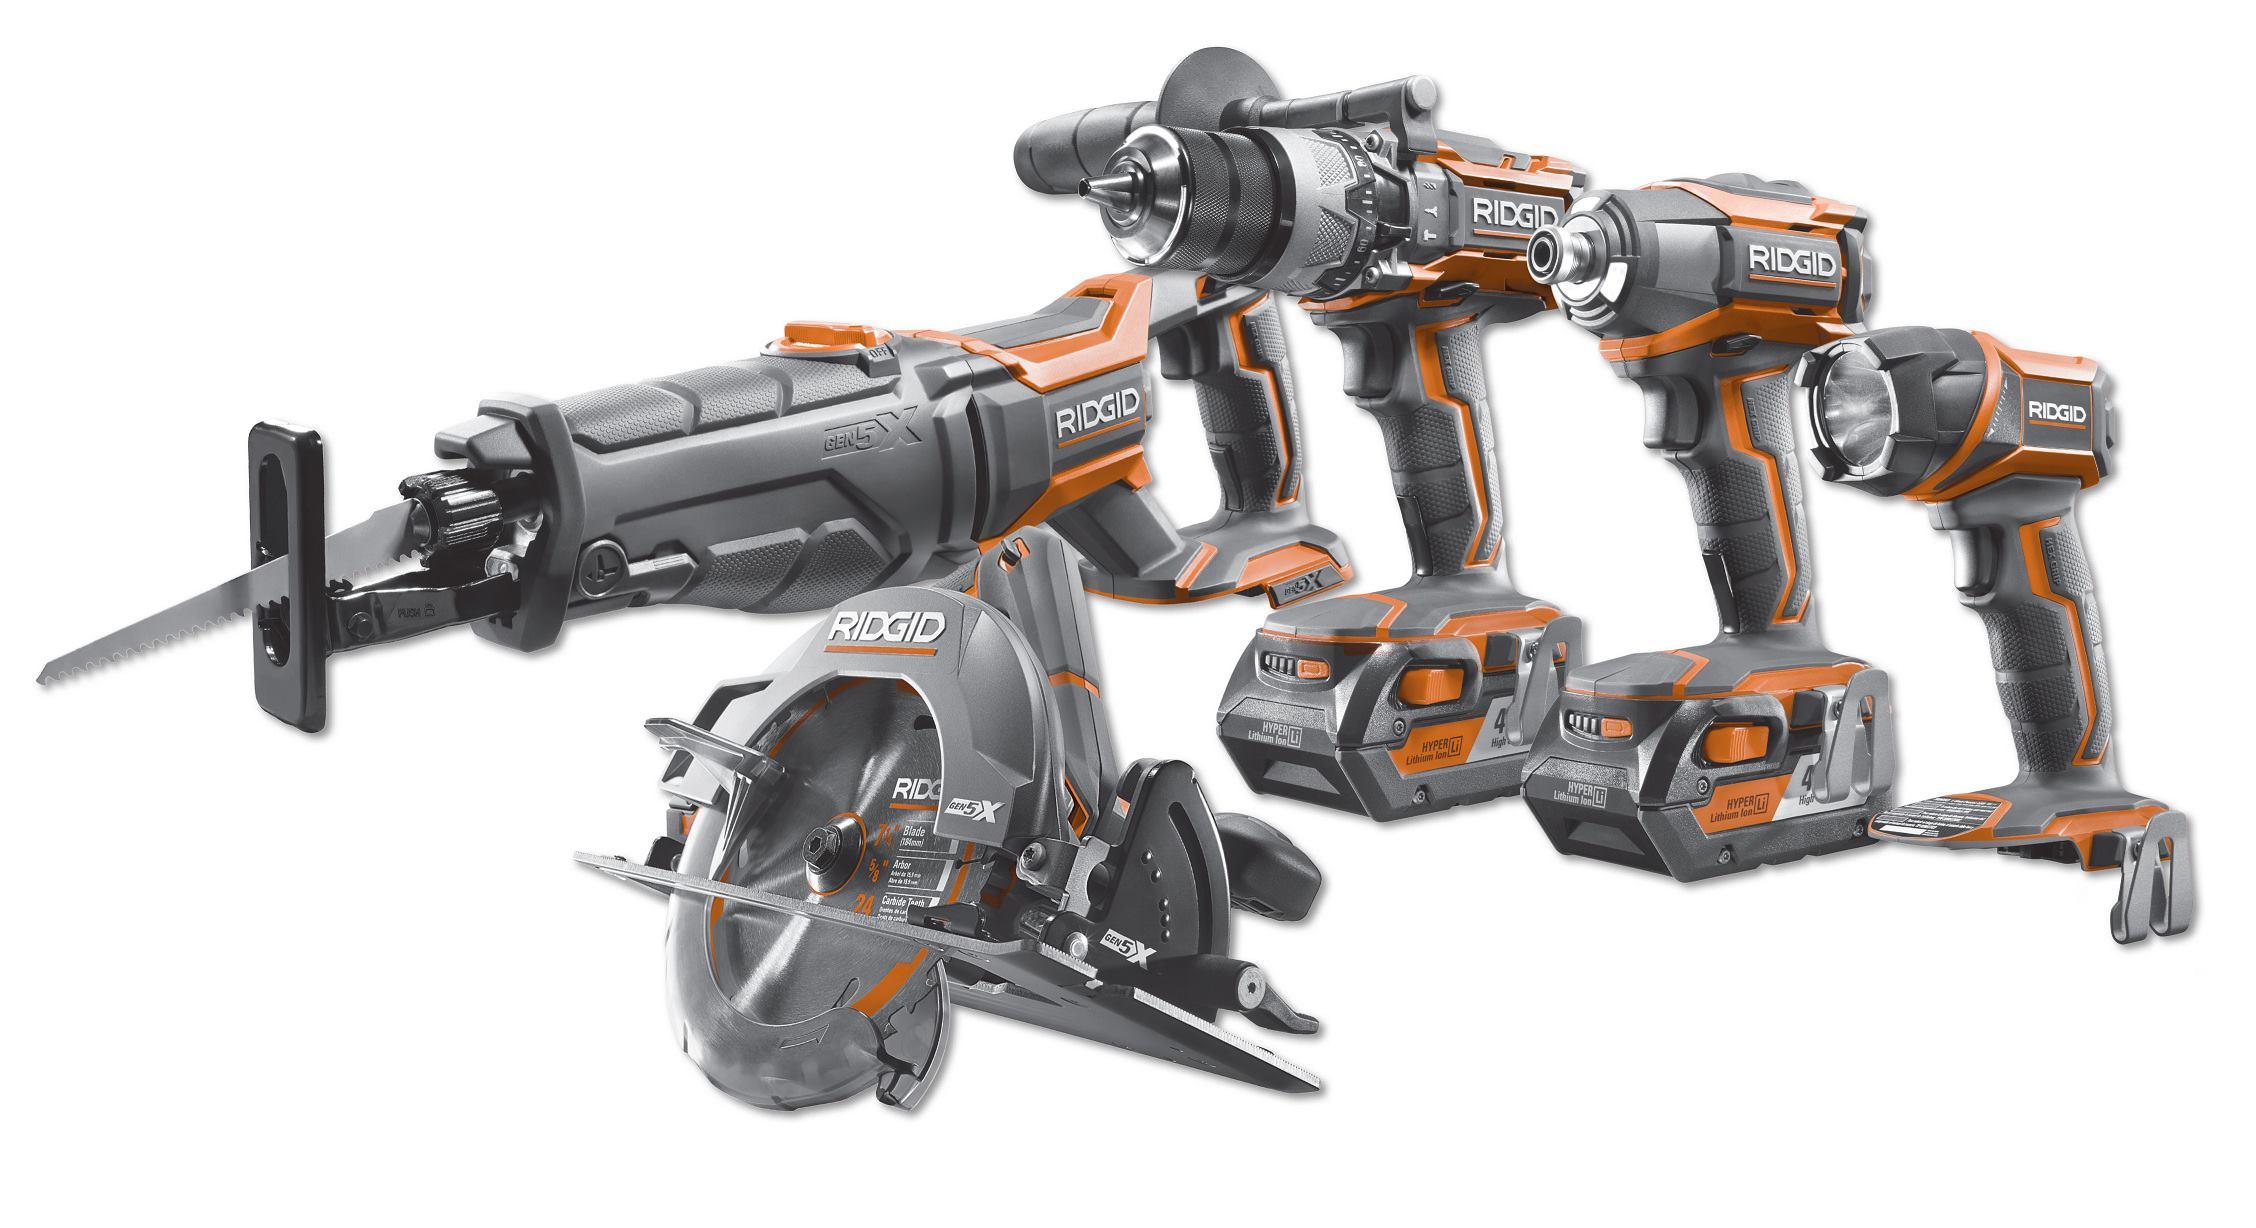 Ridgid Gen5x Combo Kit Tools Of The Trade Cordless Tools Coring